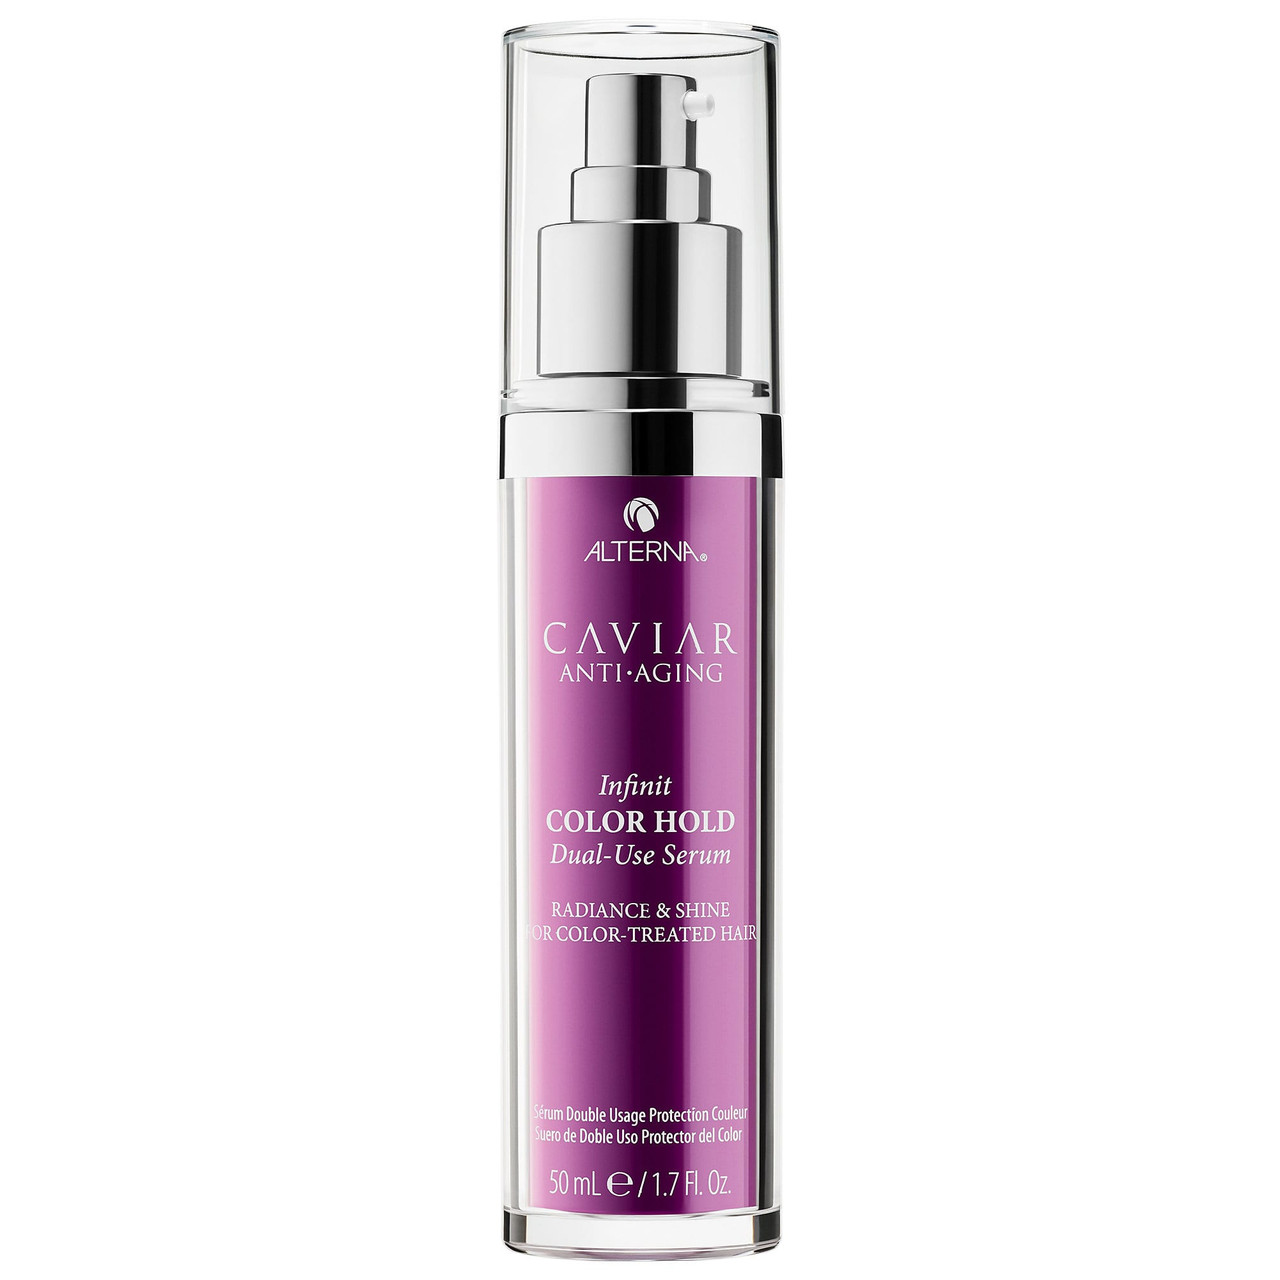 Caviar Anti-Aging Infinite Color Hold Dual-Use Serum 1.7 oz